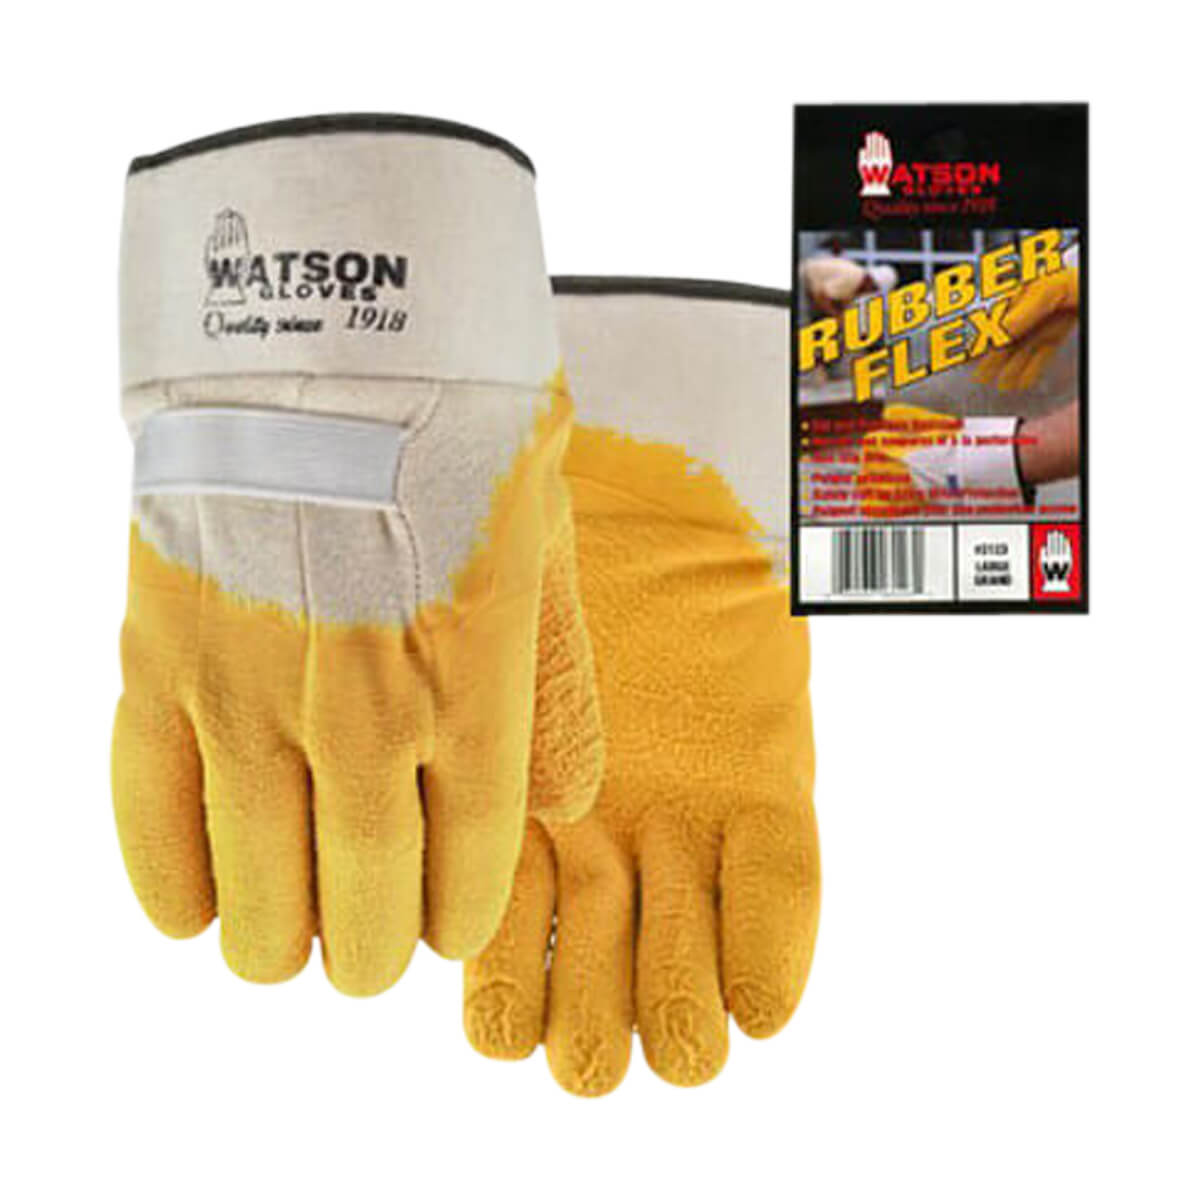 Foamtastic Gloves